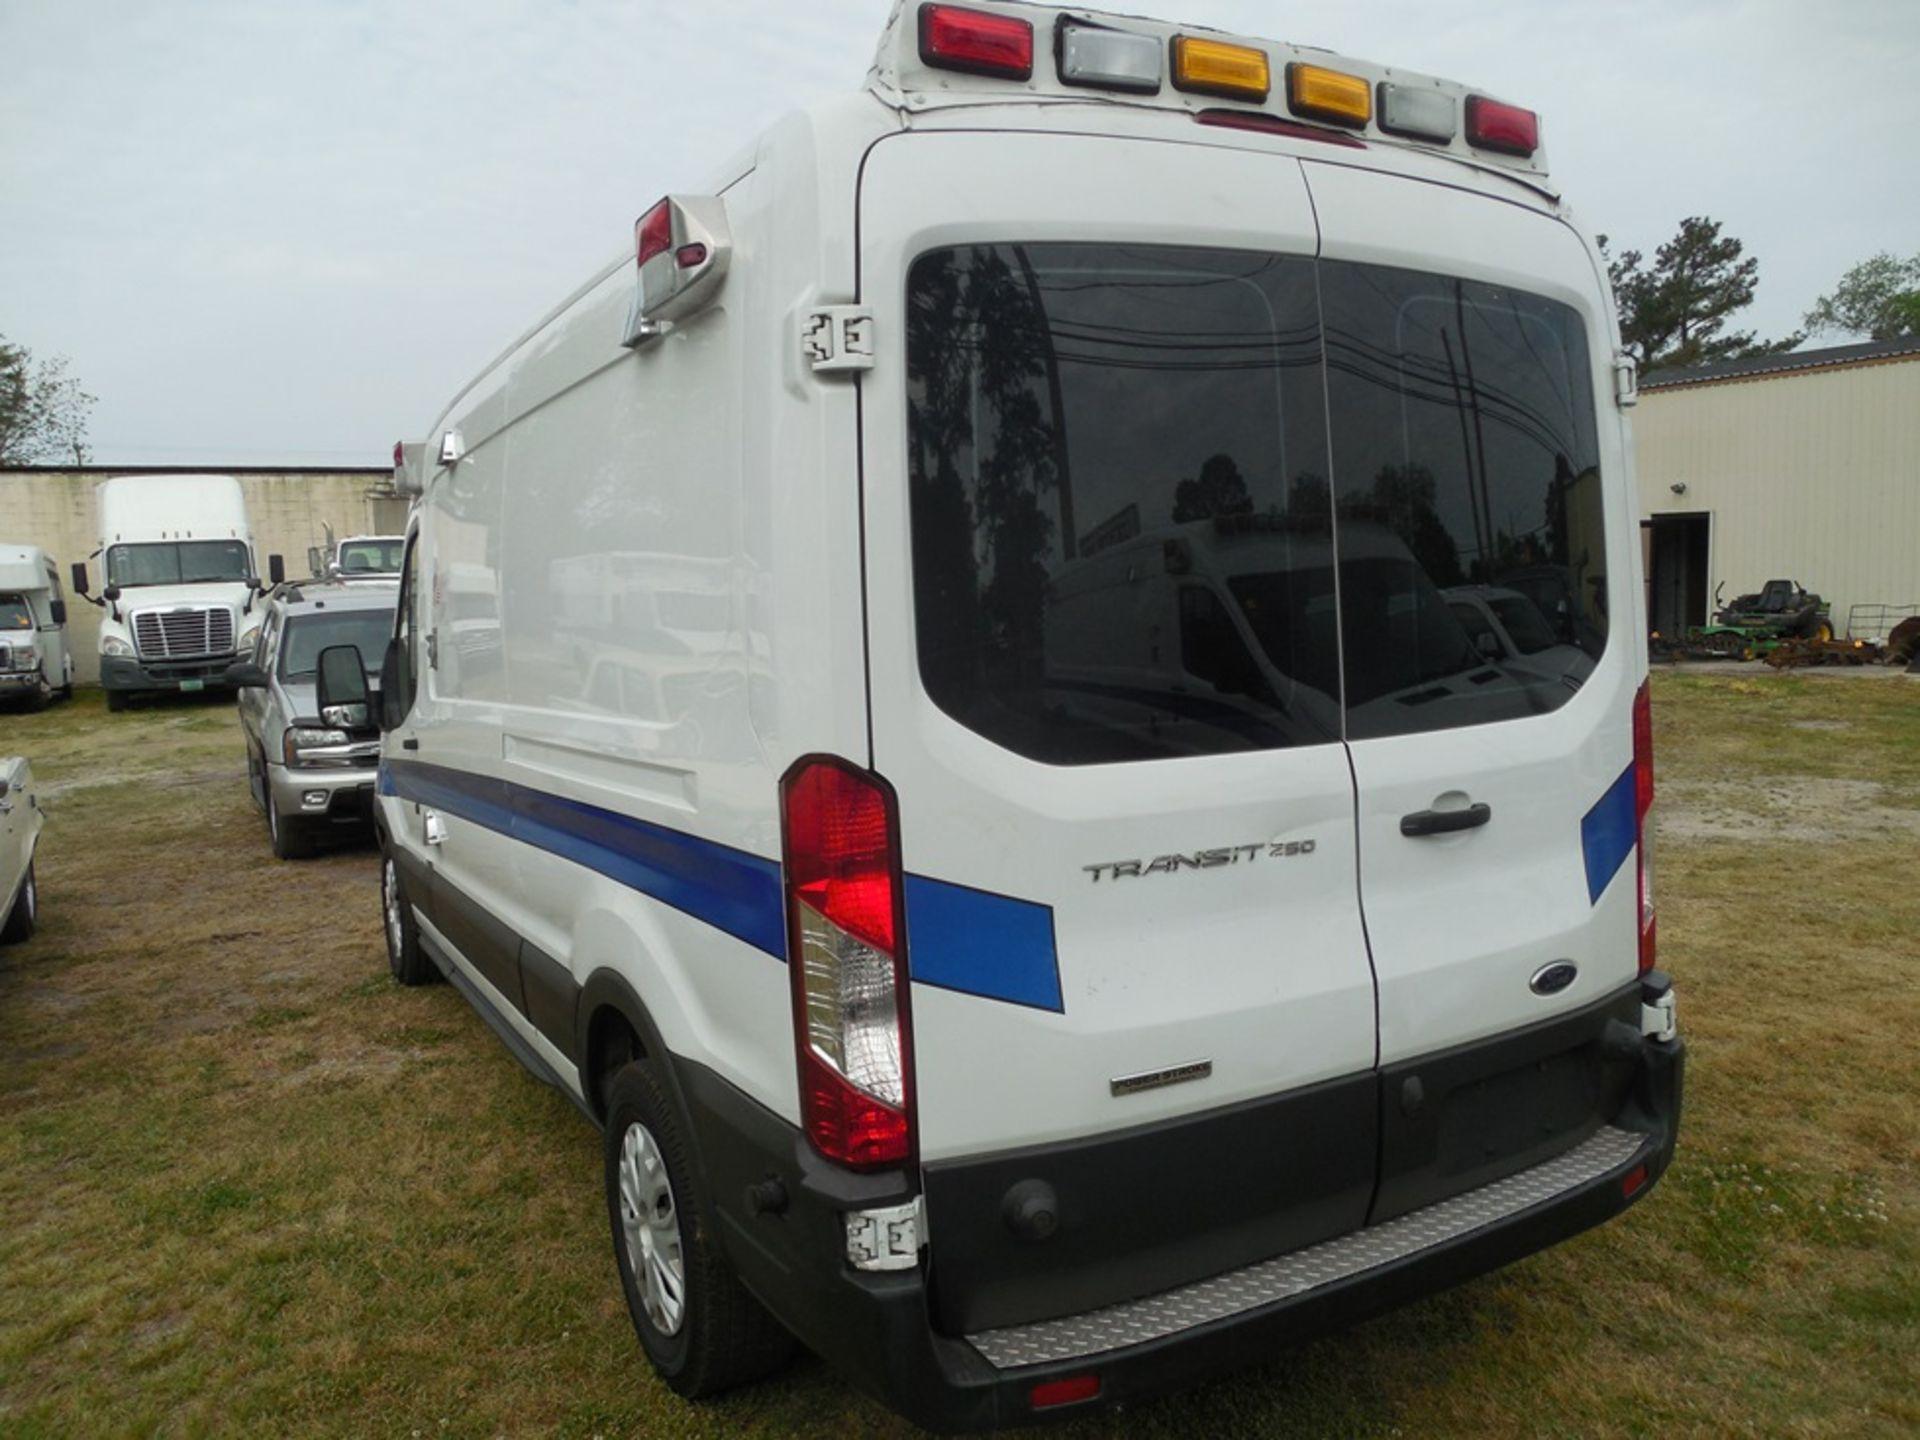 2017 Ford Tansit 250 dsl ambulance 178,503 miles vin# 1FDYR2CV2HKA57713 - Image 5 of 6